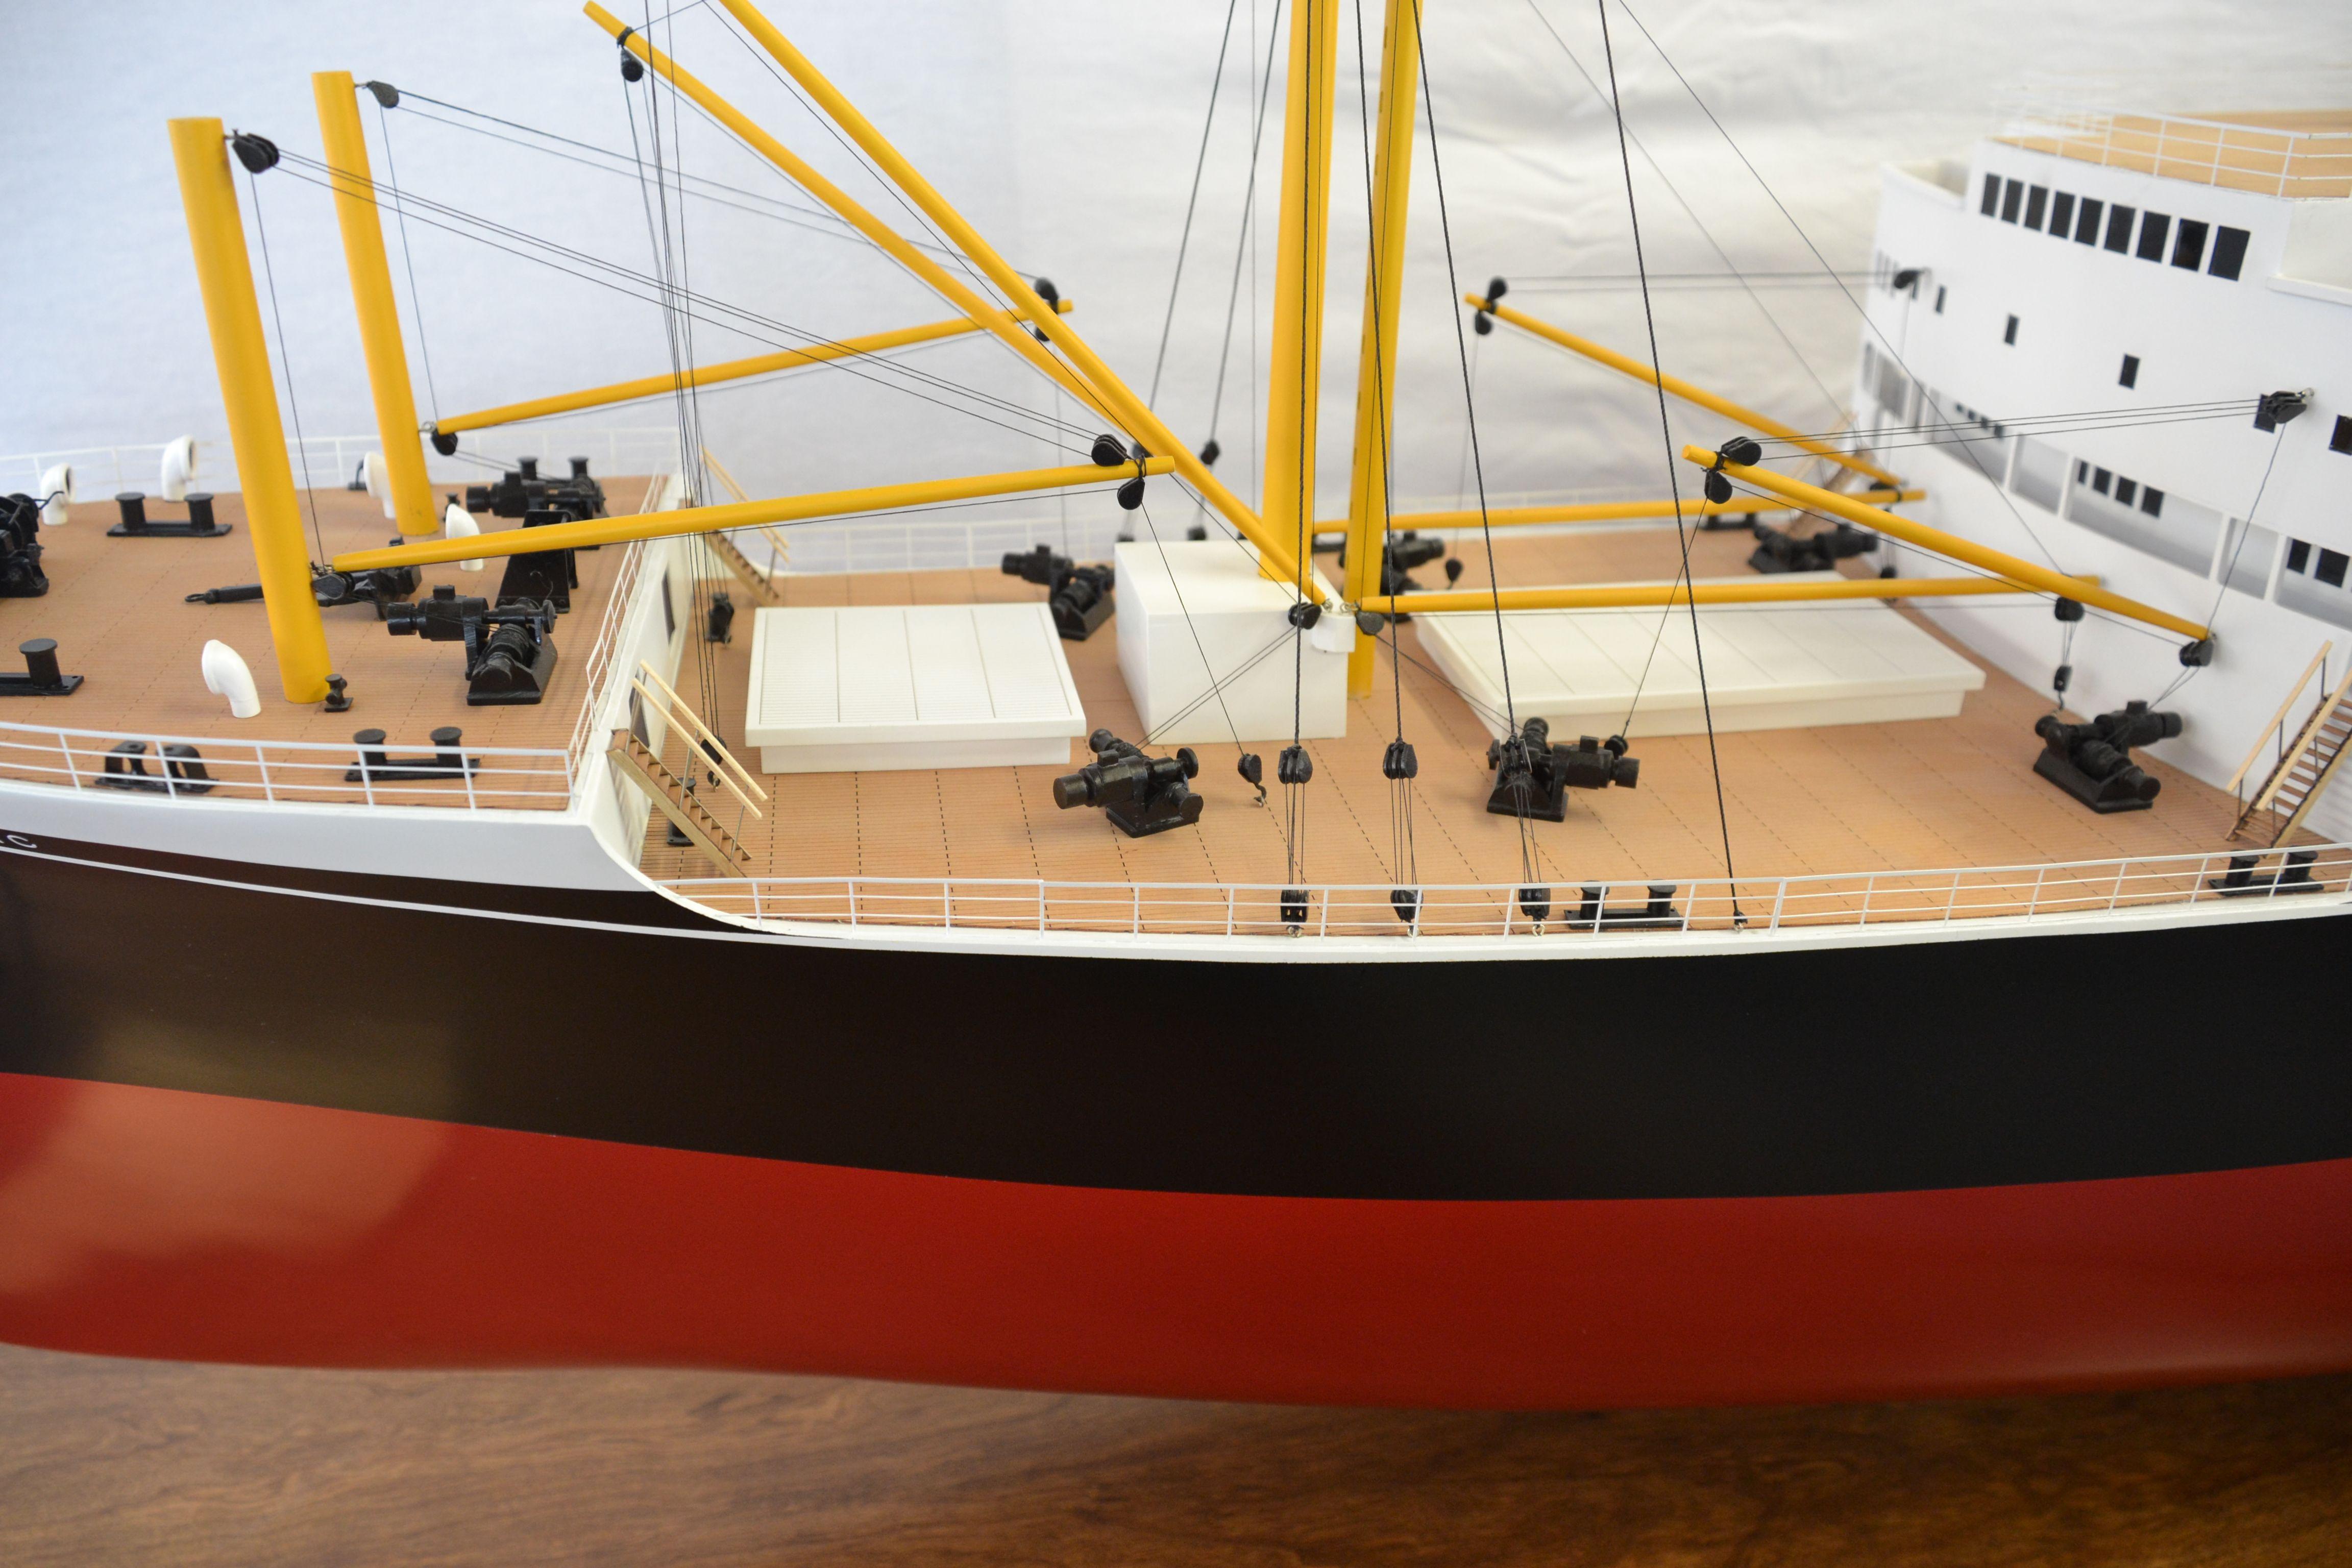 2209-12948-SS-Corinthic-Model-Ship